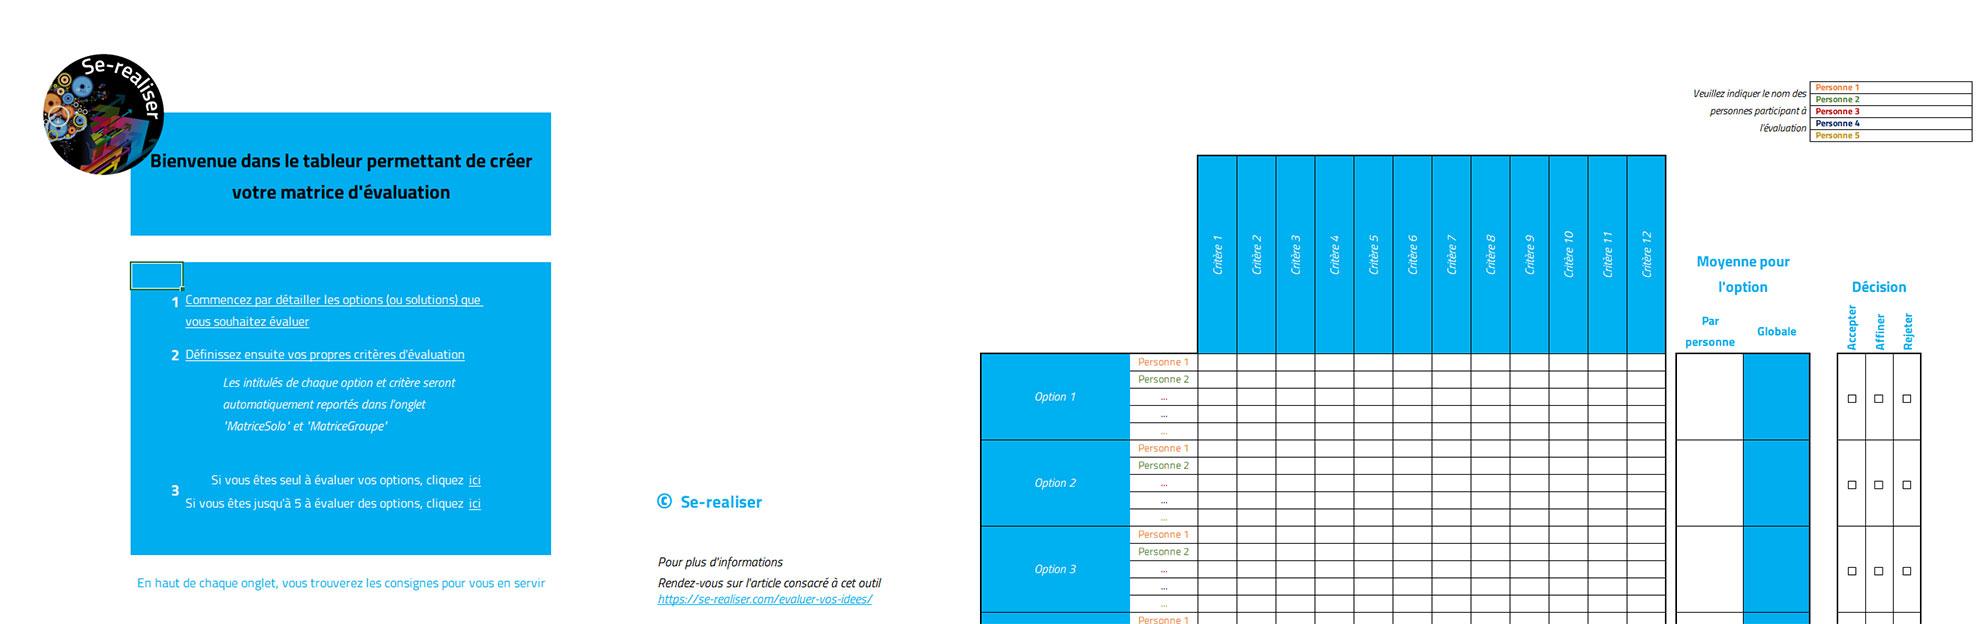 Aperçu Excel de la matrice d'évaluation